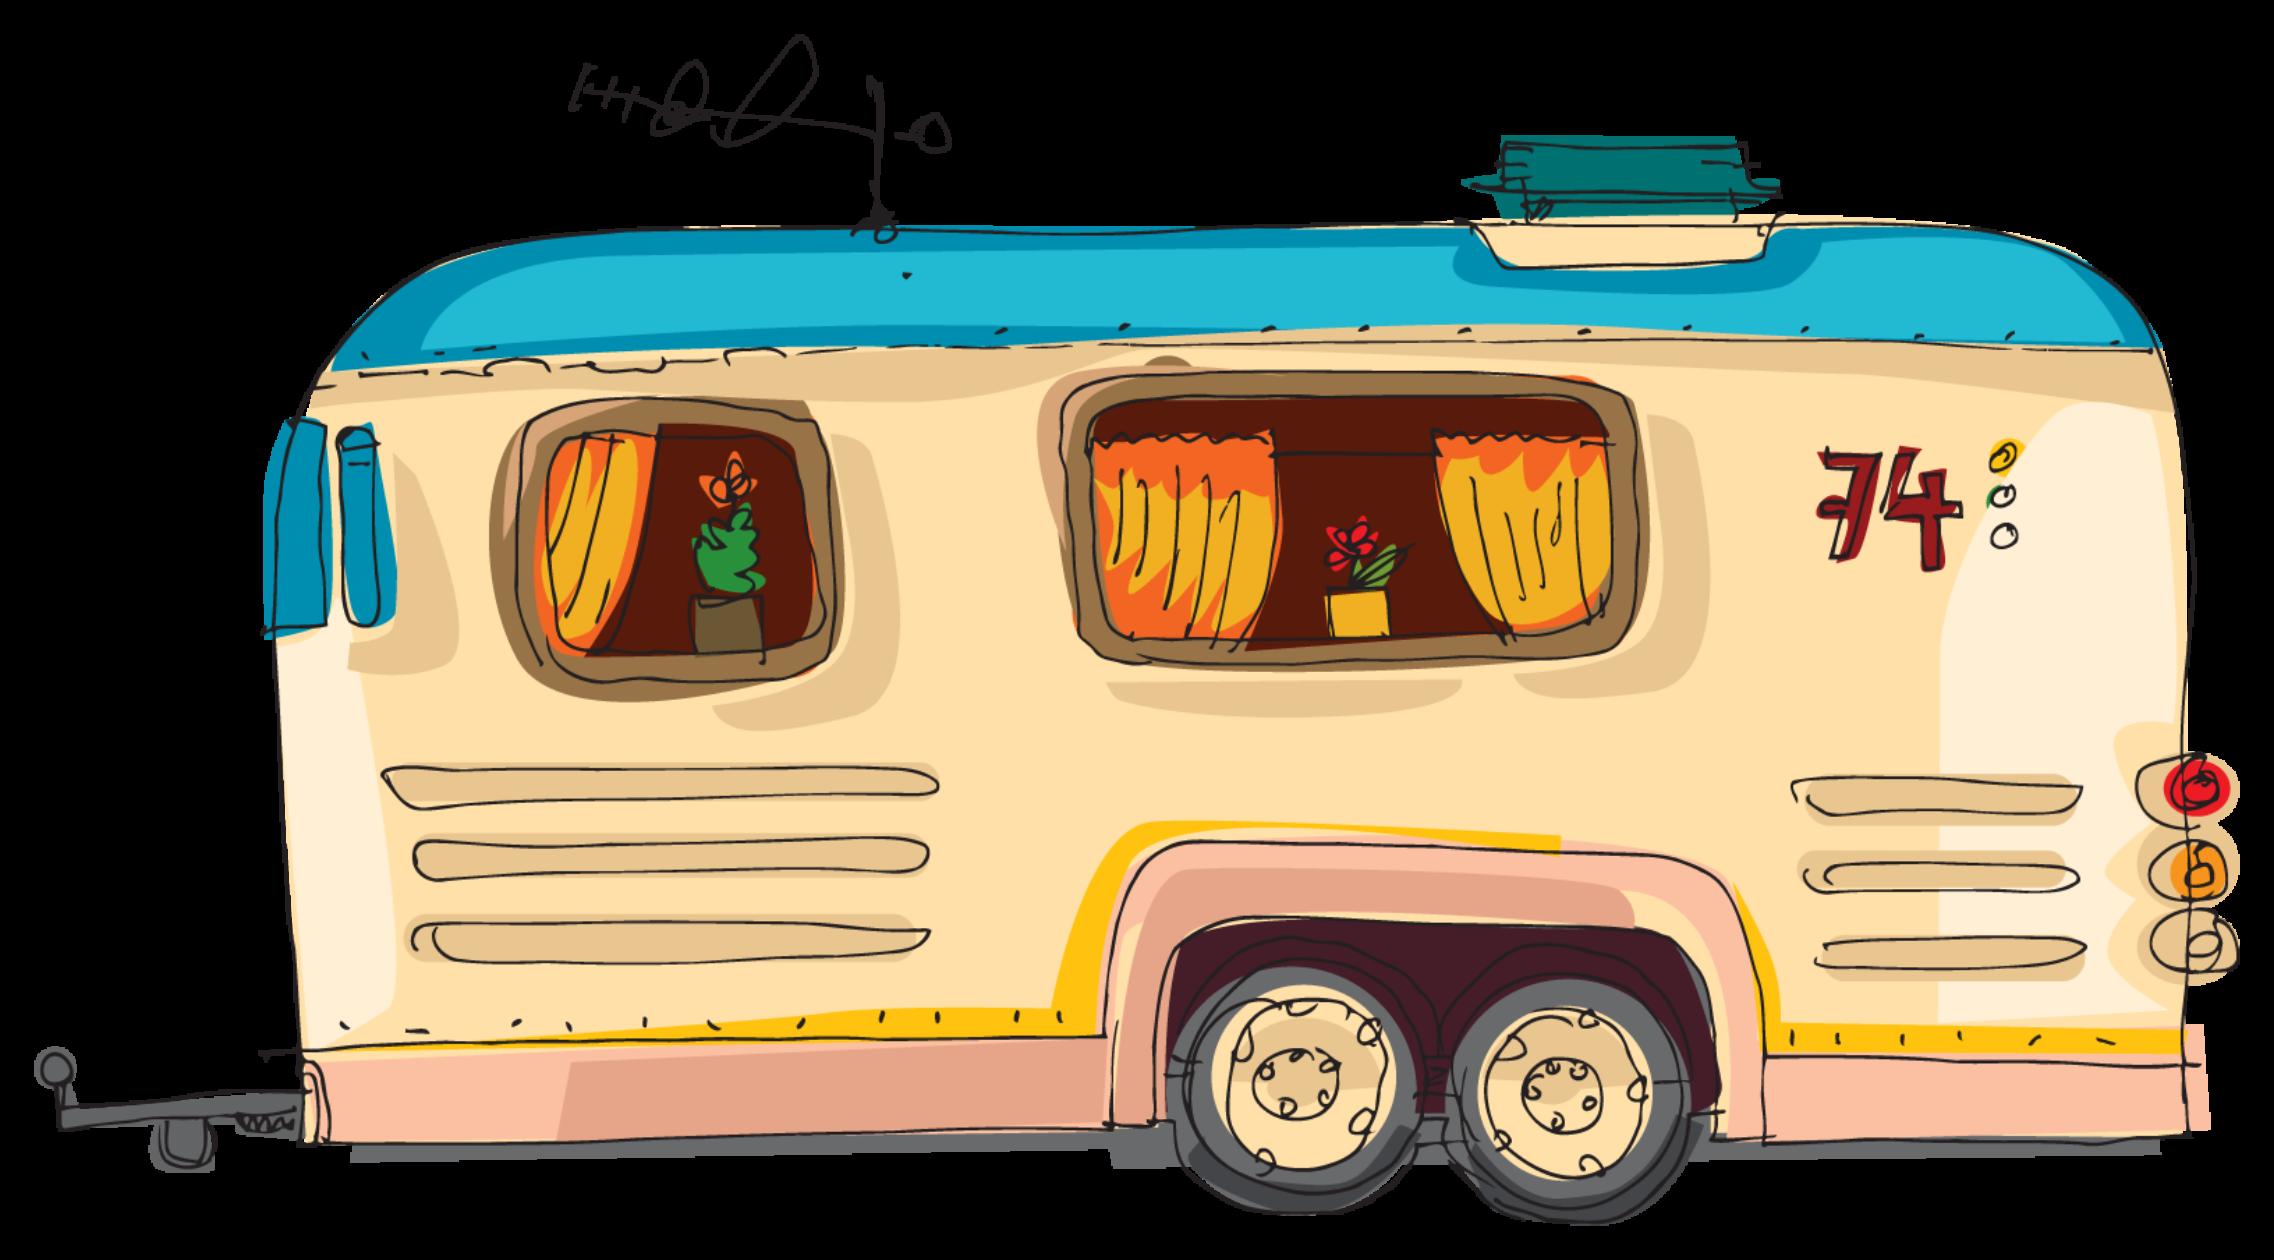 Folding Camper or Caravan??